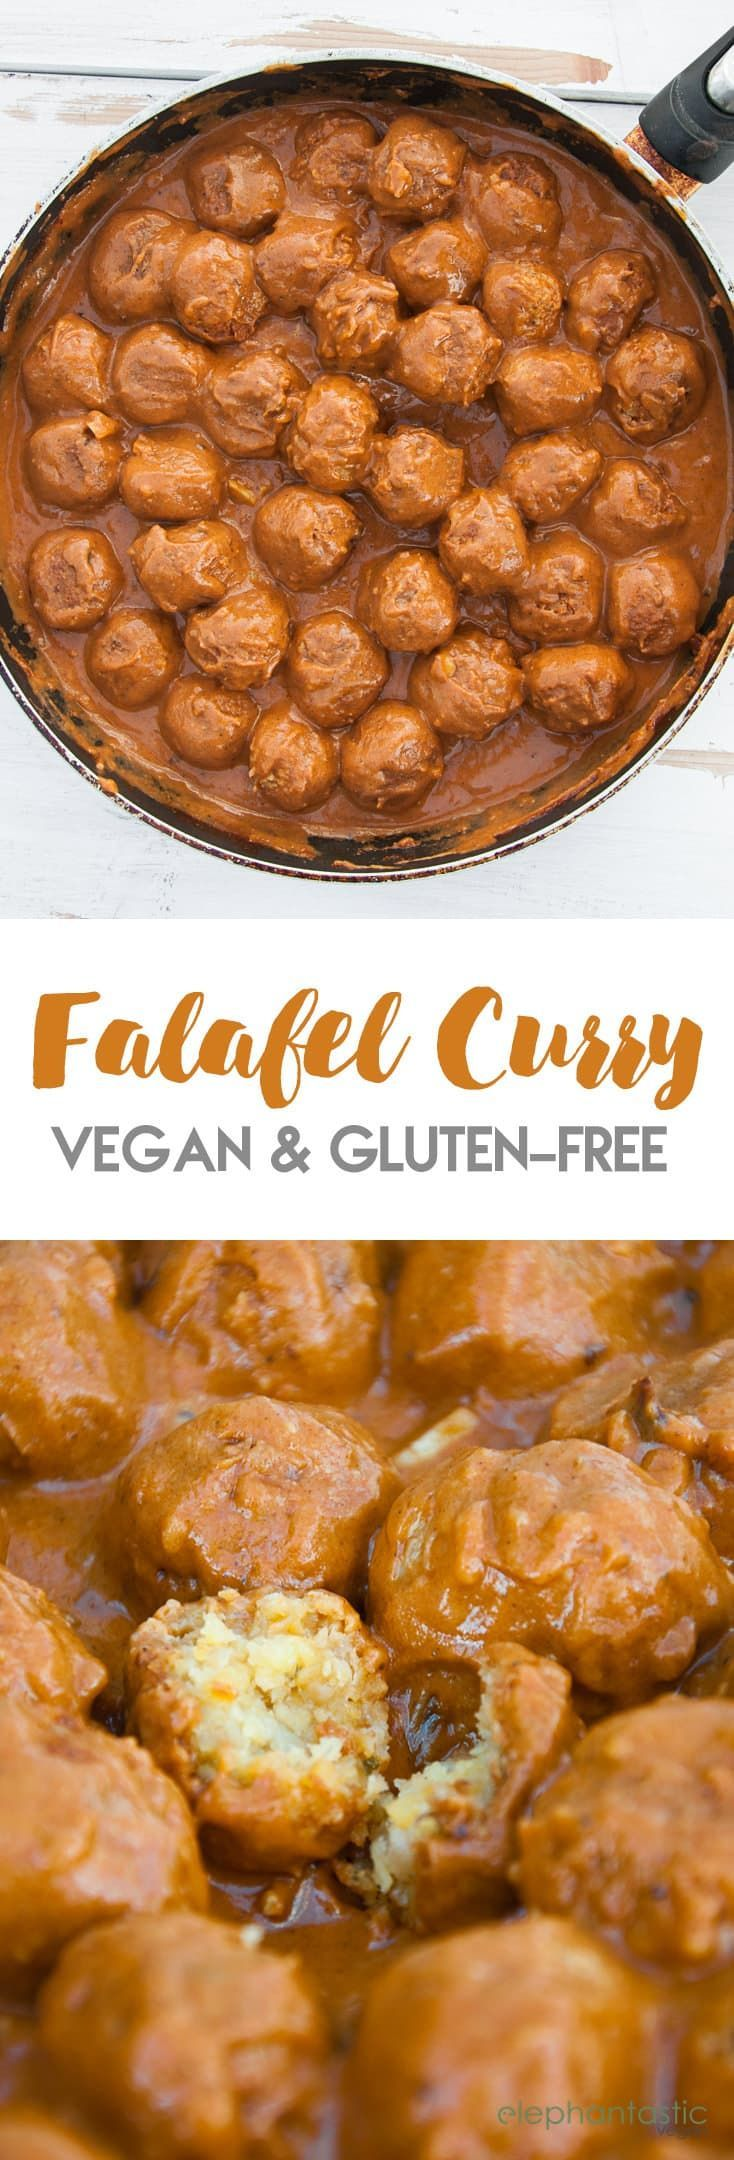 Veganes Falafel Curry - Curry mit Kichererbsenbällchen